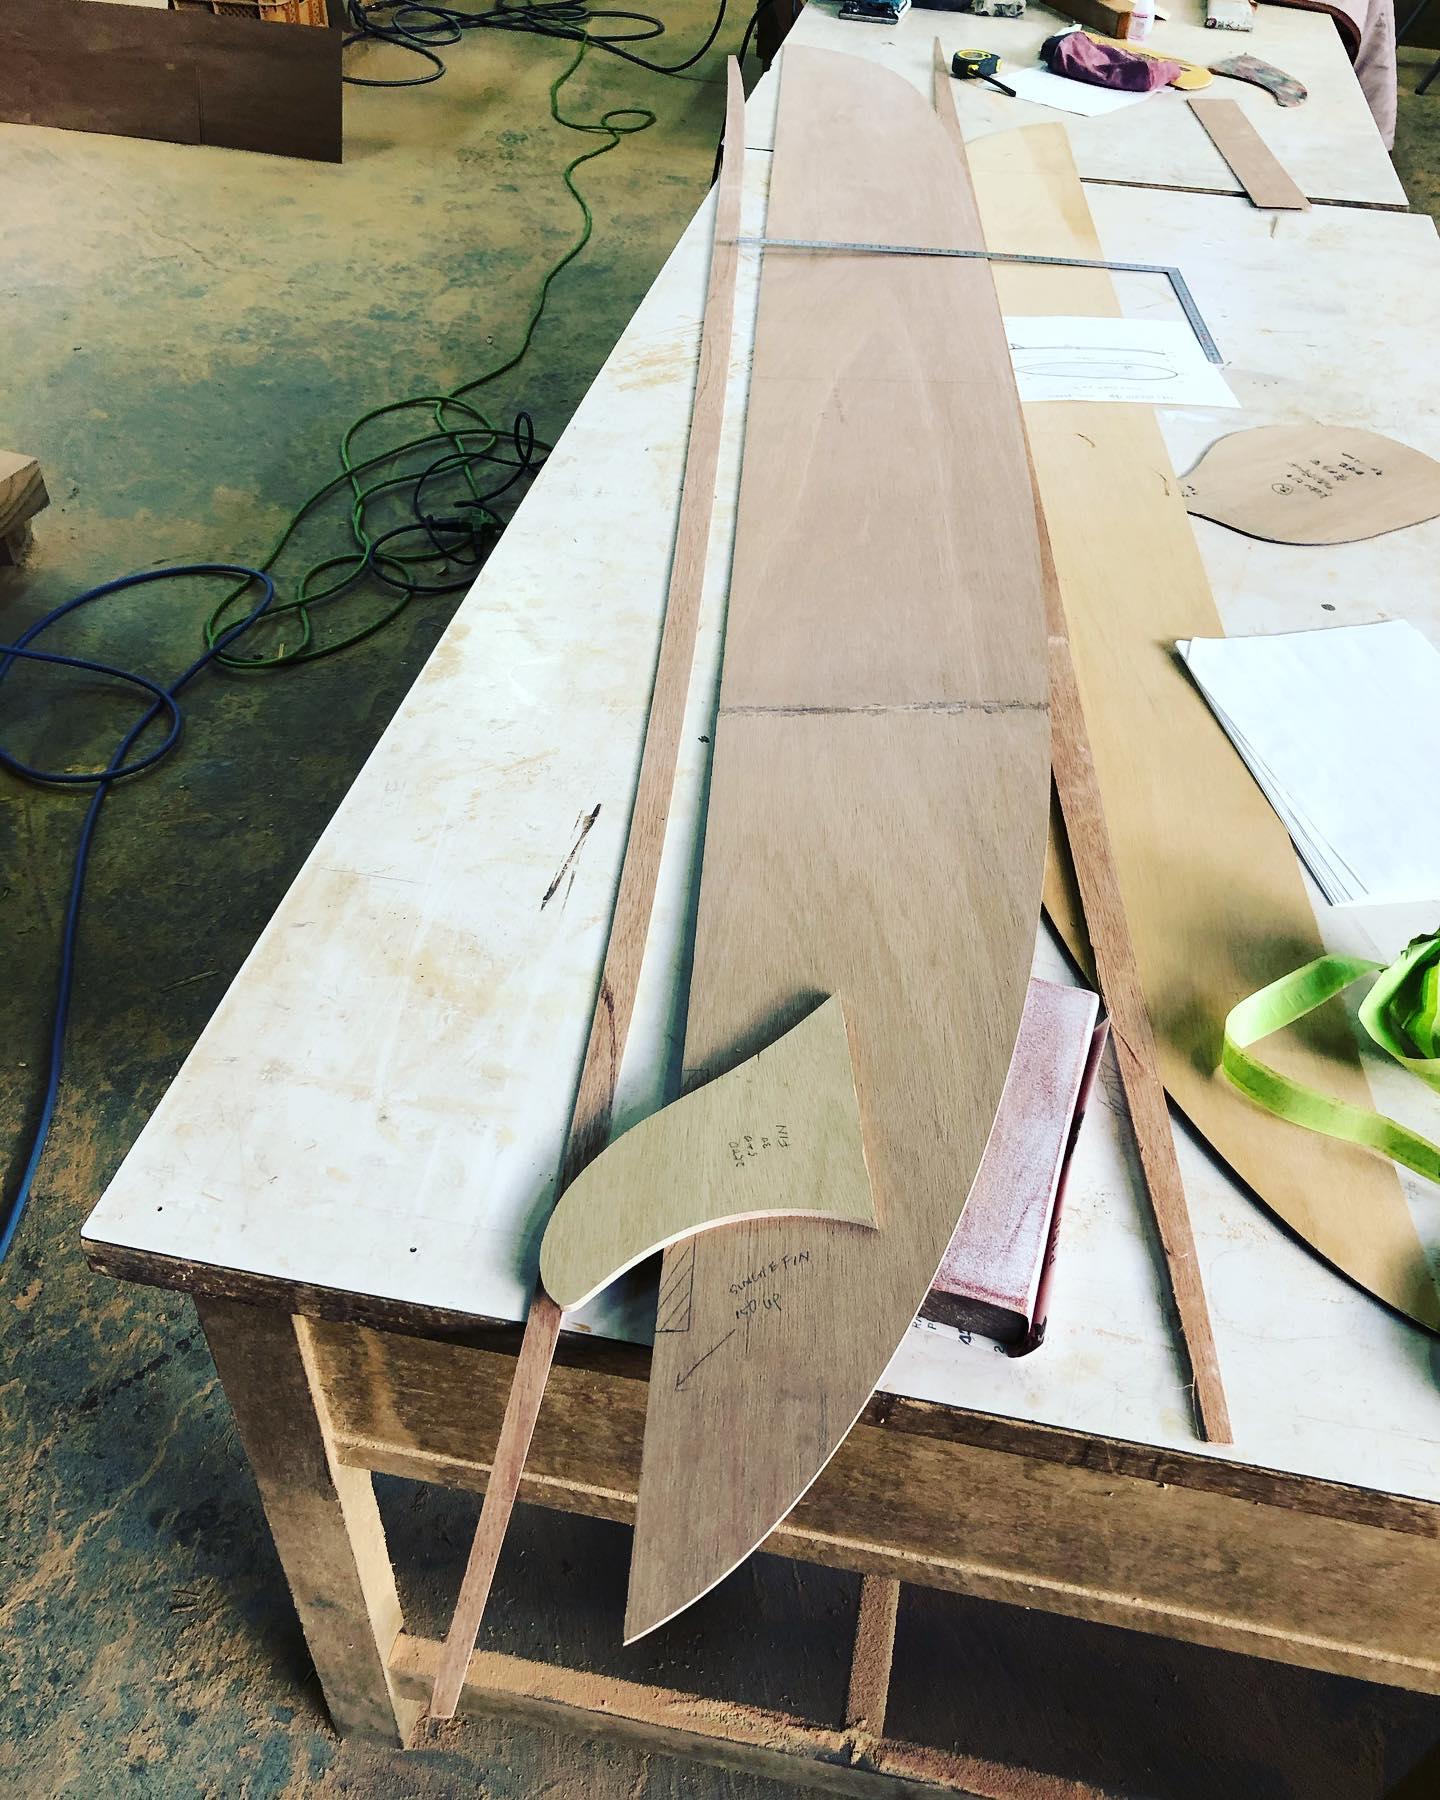 woodboardkukuウッドボード製作開始。まずは、今回のボードデザインのアウトラインテンプレート、フィンテンプレートとロッカーゲージを作ります。#woodboardkuku#木頭杉#徳島杉#ウッドボード#surfing#surfboard#woodsurfboards @woodboardkuku @indianeagleyasu @nakawood